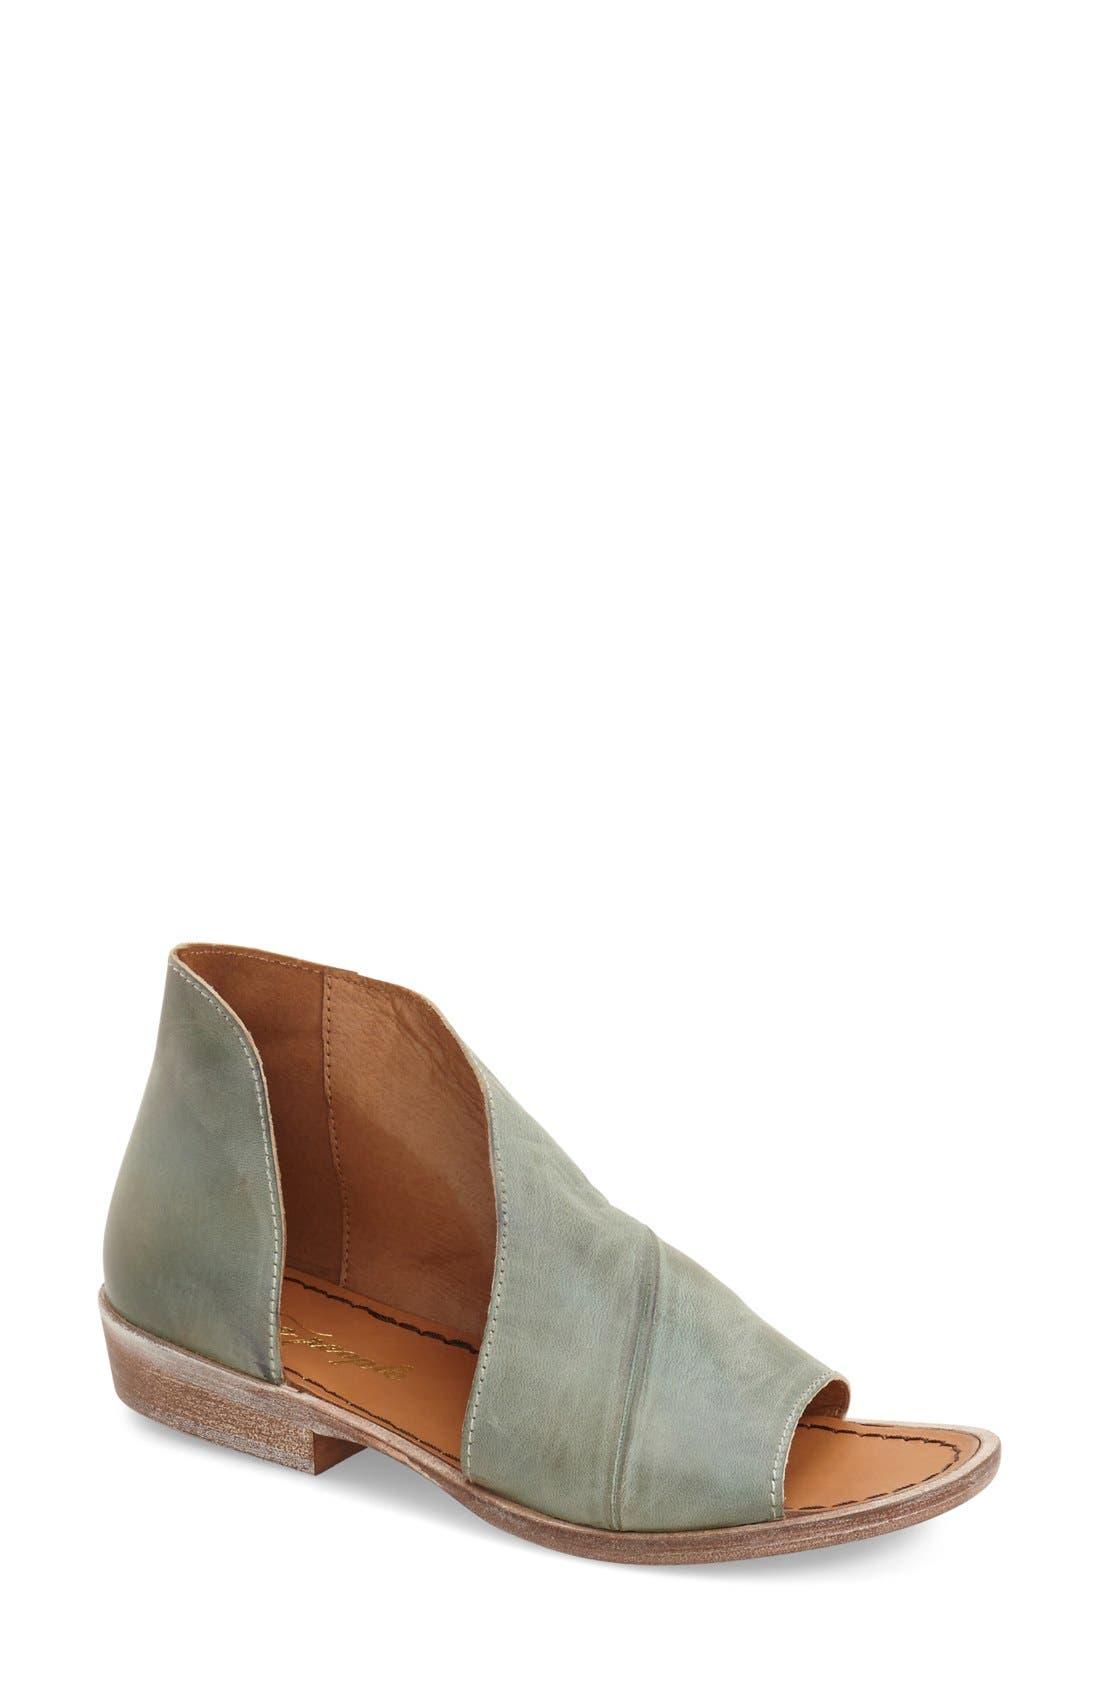 'Mont Blanc' Asymmetrical Sandal,                             Main thumbnail 13, color,